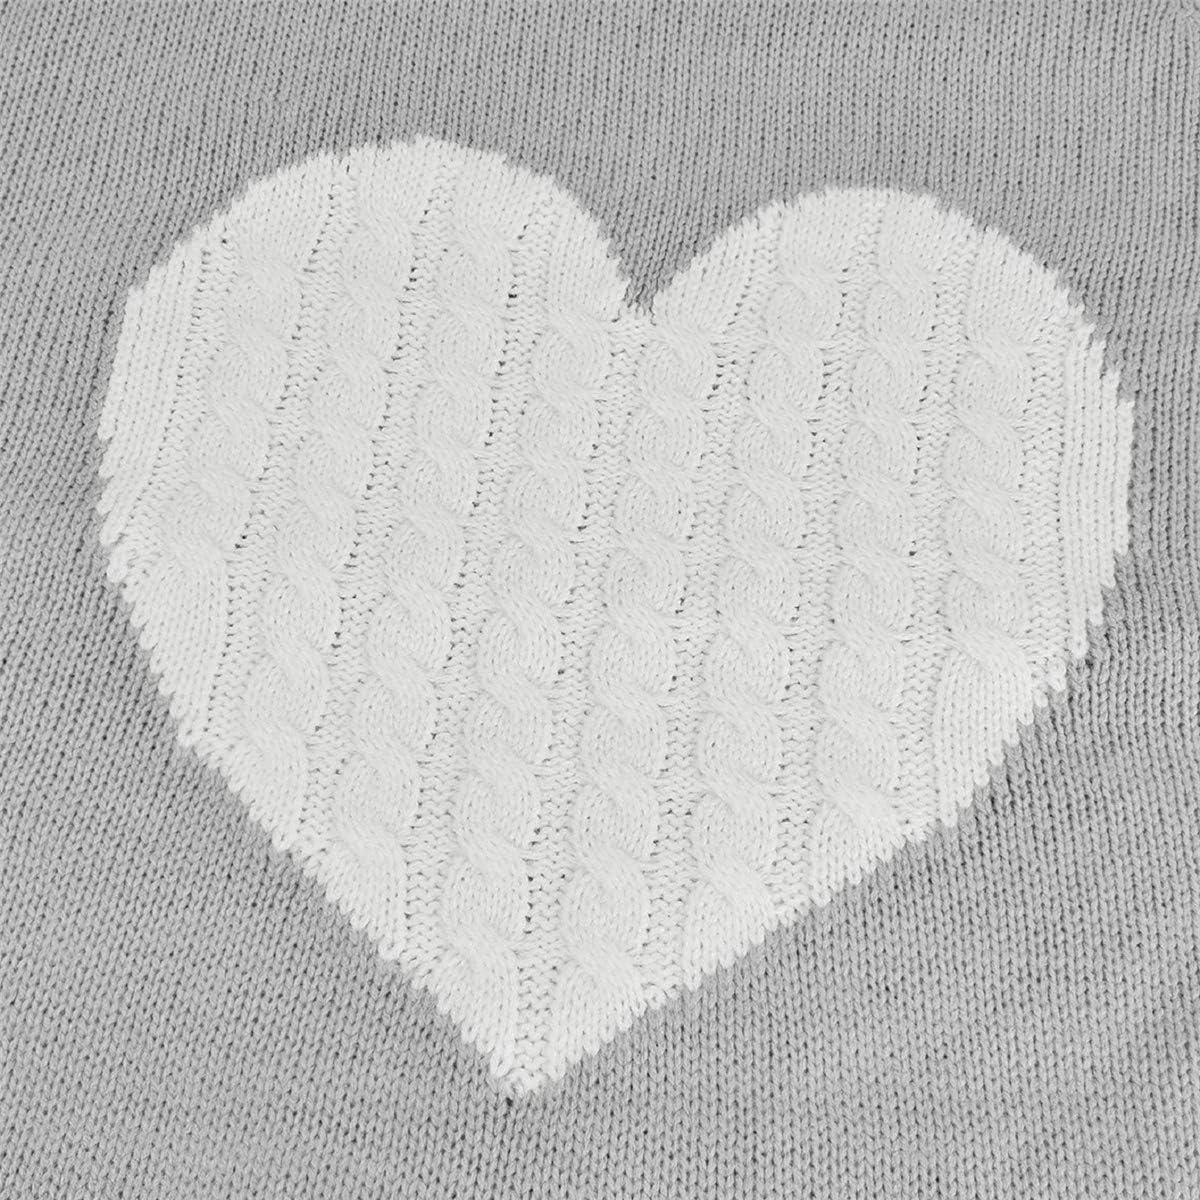 Tuopuda Jersey Mujer Oto/ño Punto Su/éter B/ásico Jers/éis Casual s/ólido Largo Manga Jersey Amor su/éter Suelto Sudaderas de O-Cuello Invierno Oversize Blusas Tops